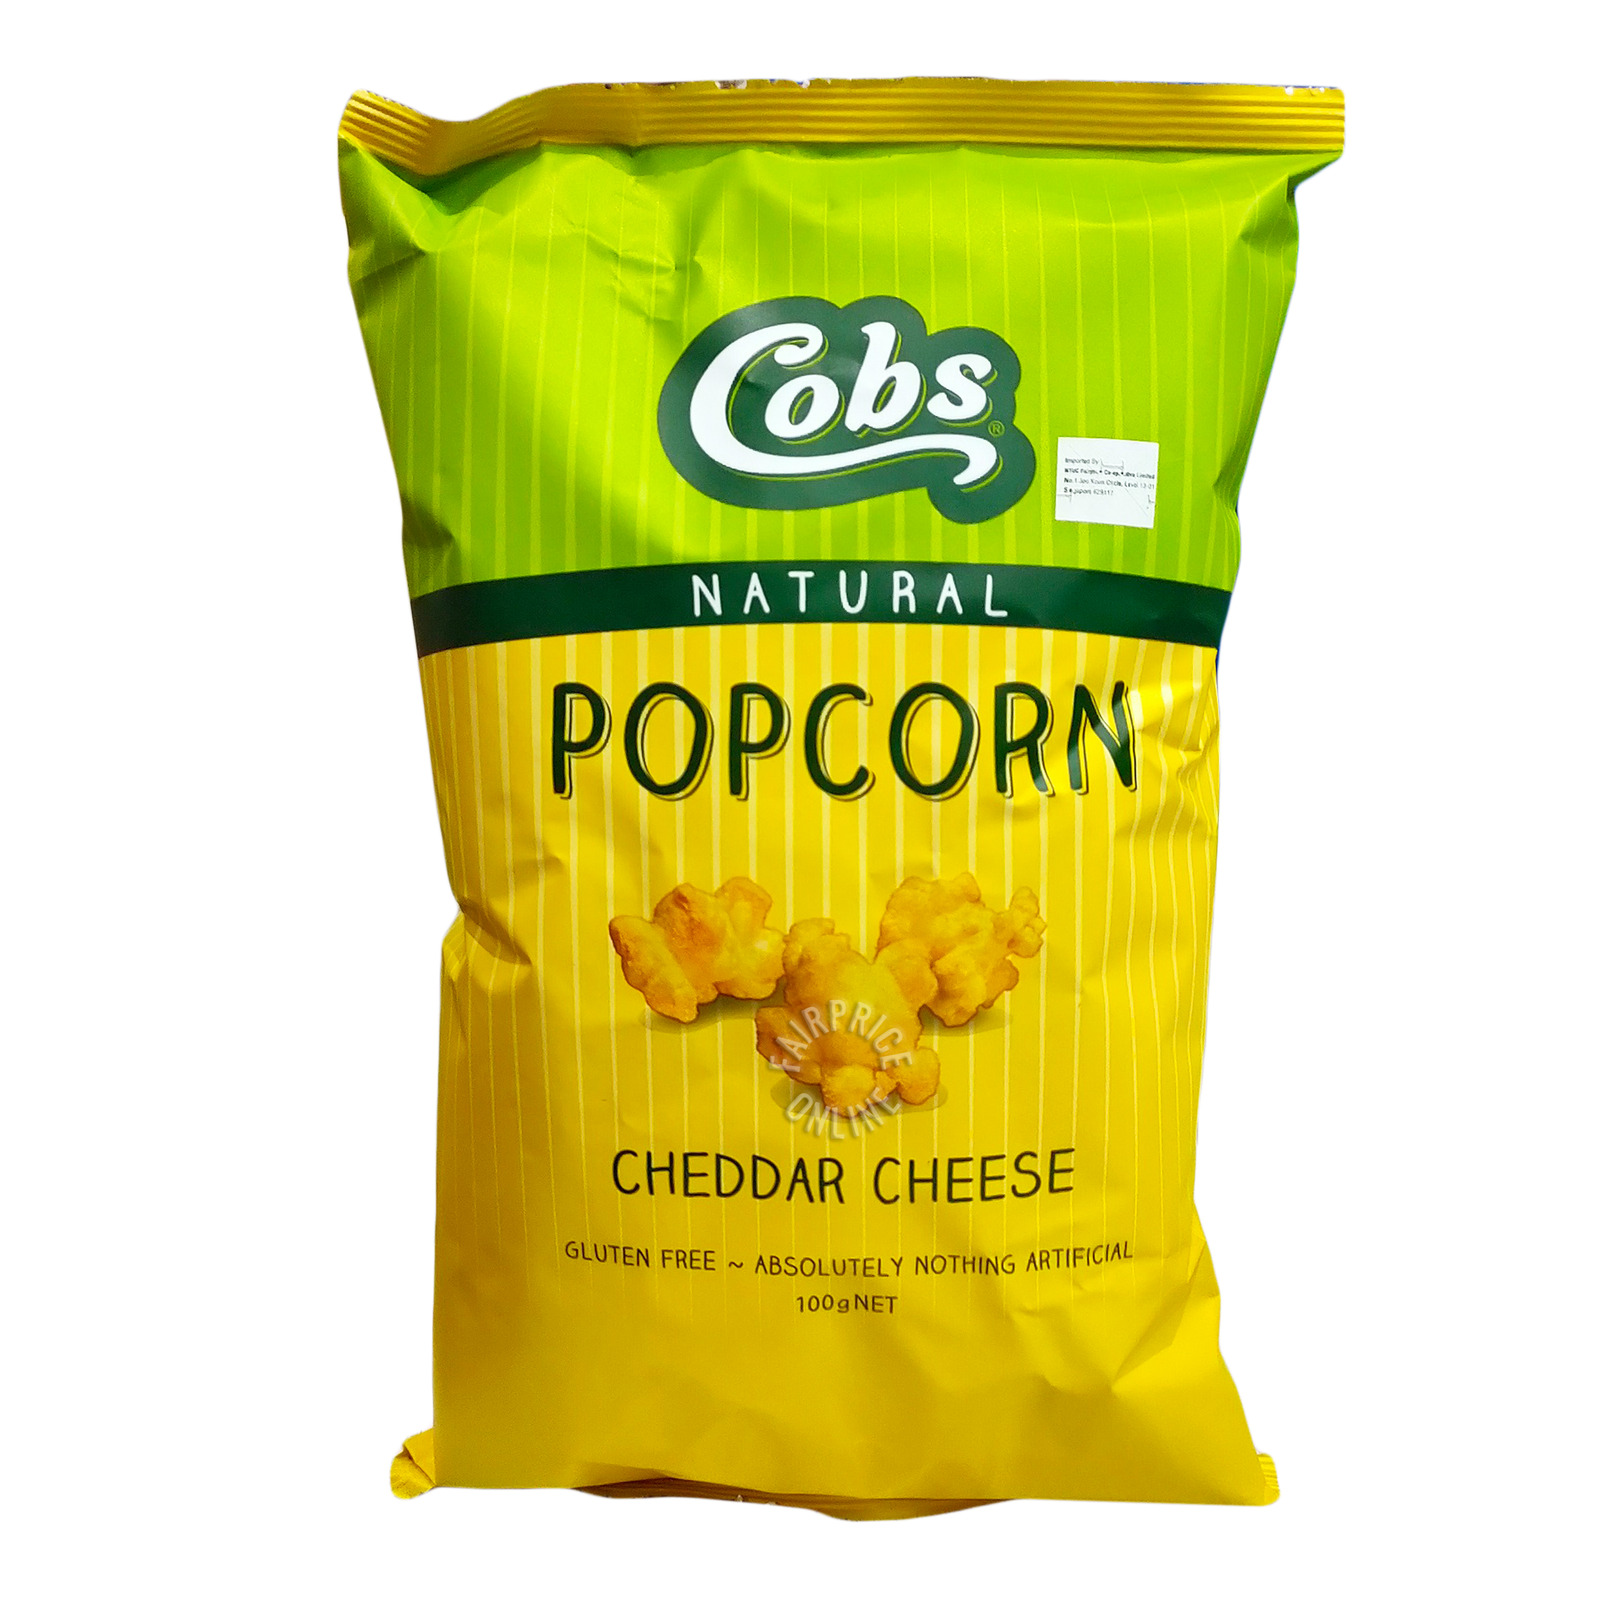 Cobs Natural Popcorn - Cheddar Cheese